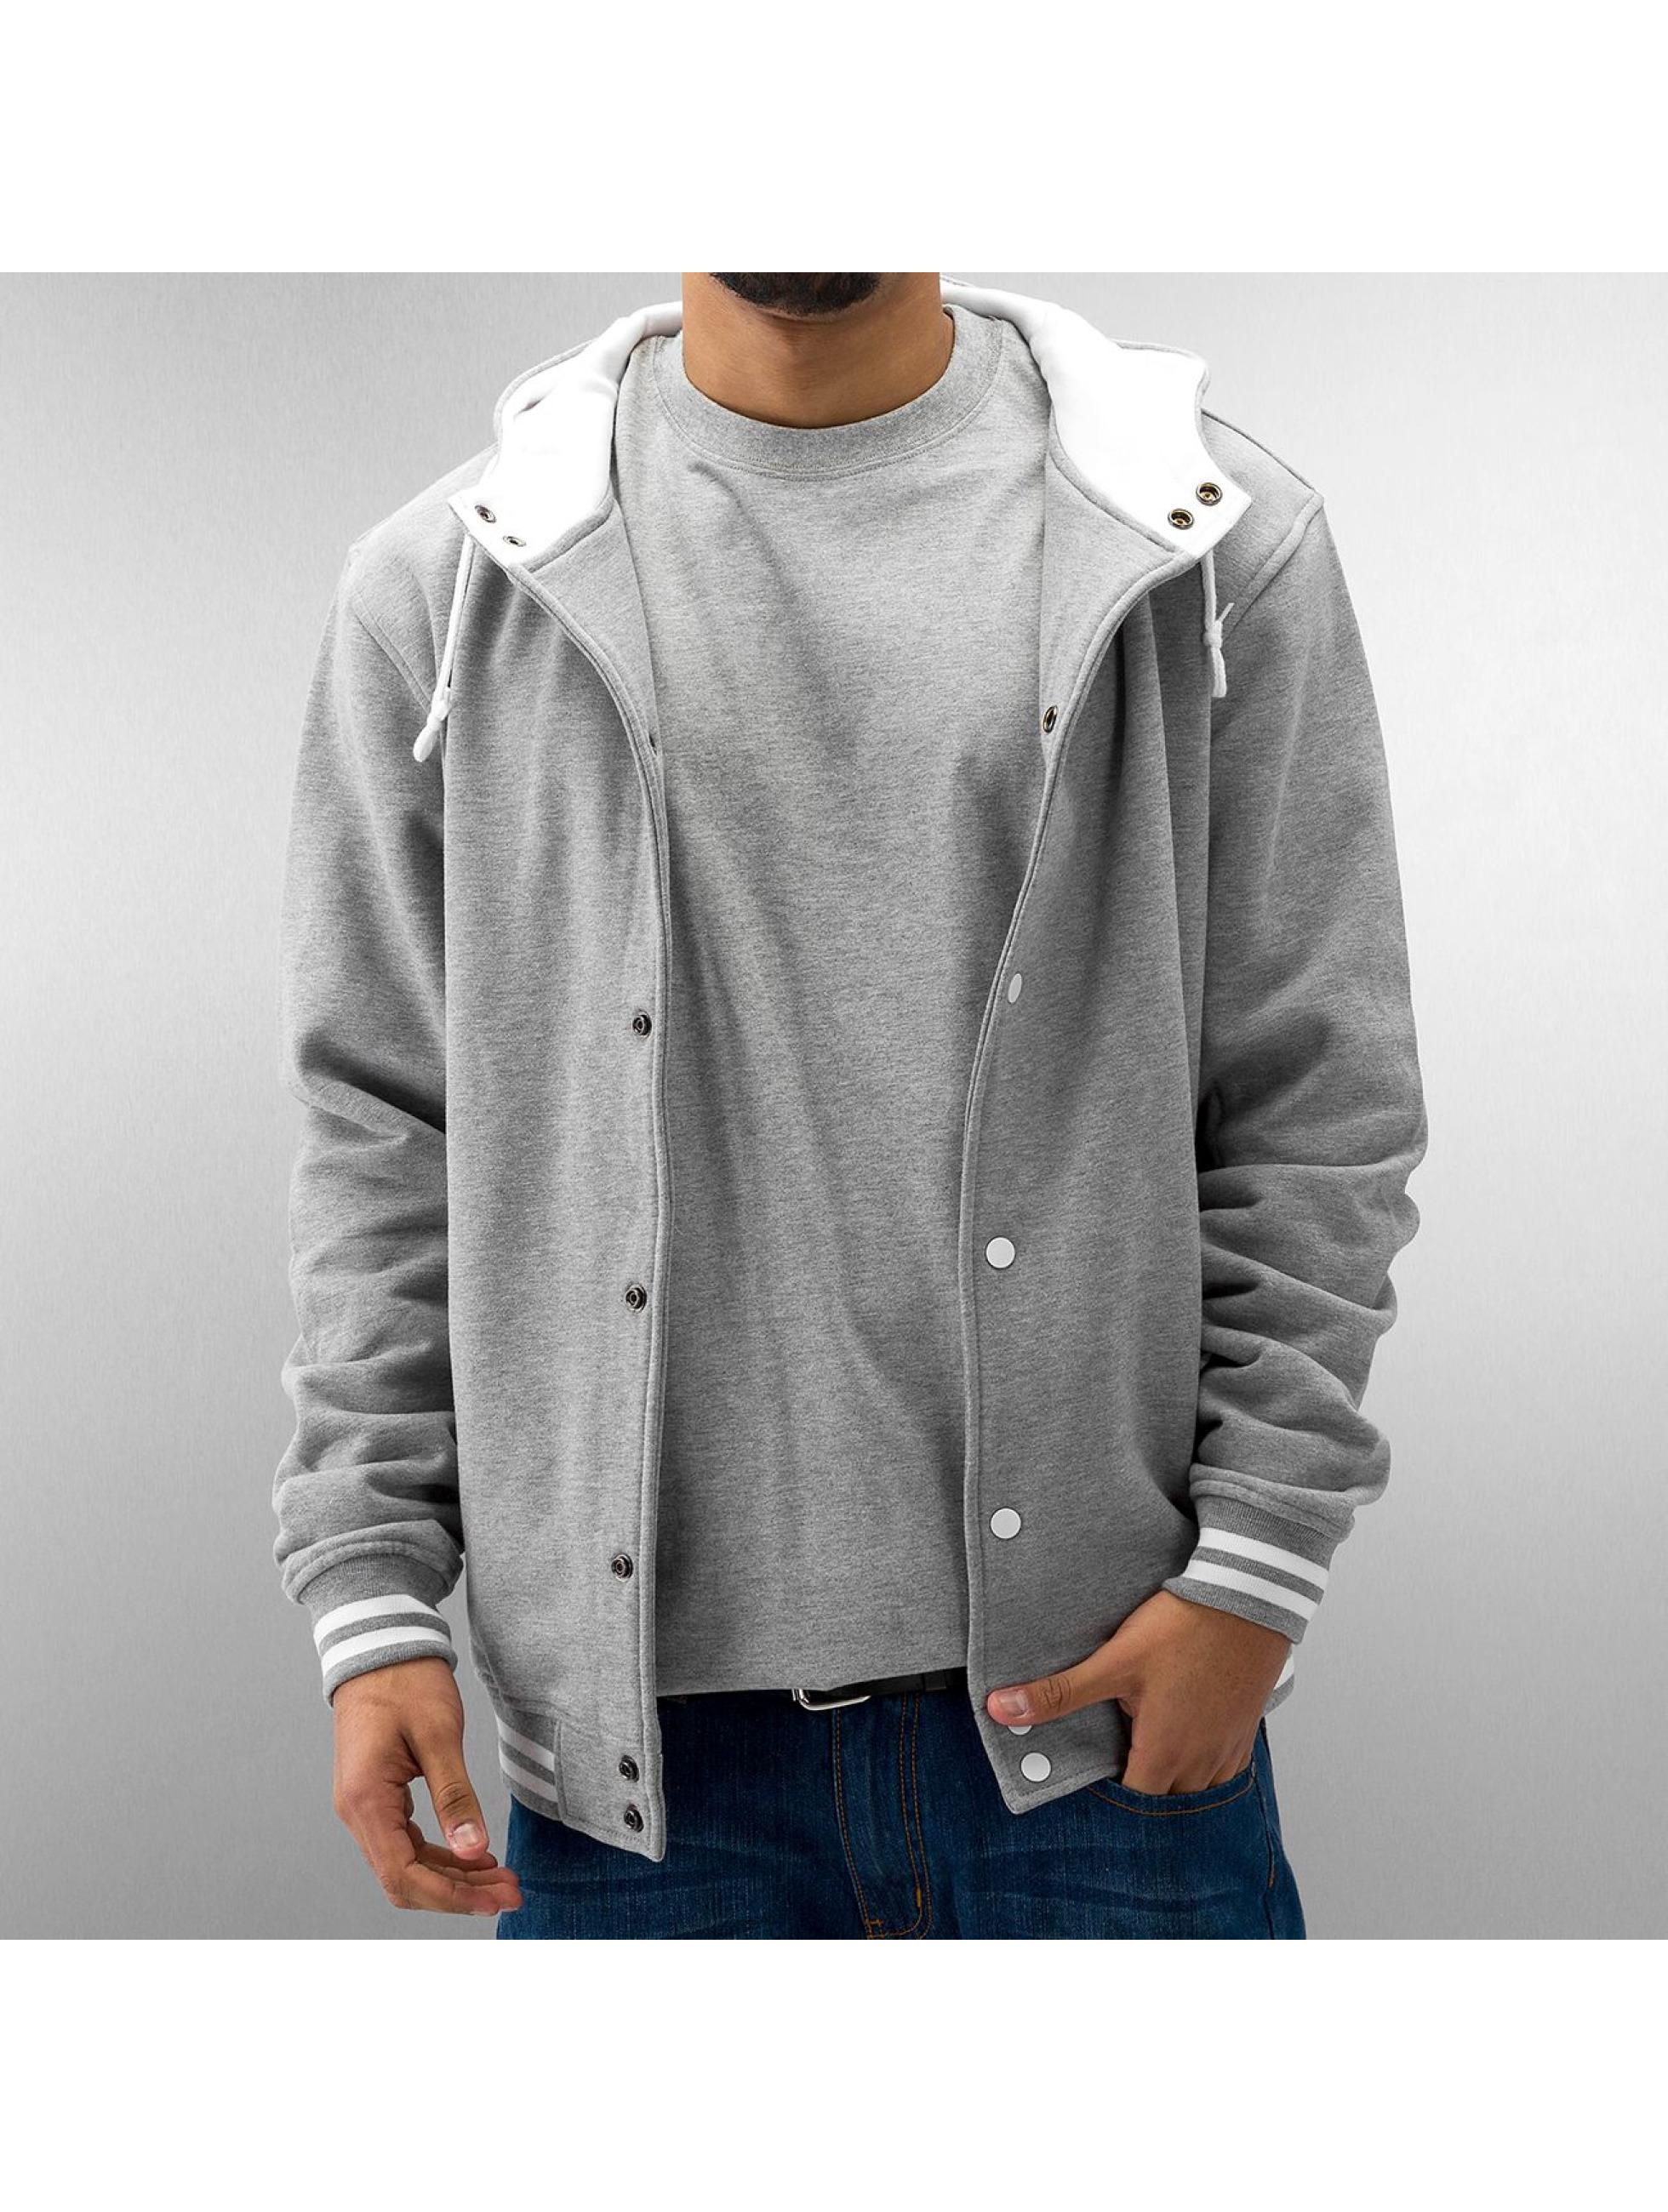 Urban Classics Университетская куртка Hooded серый